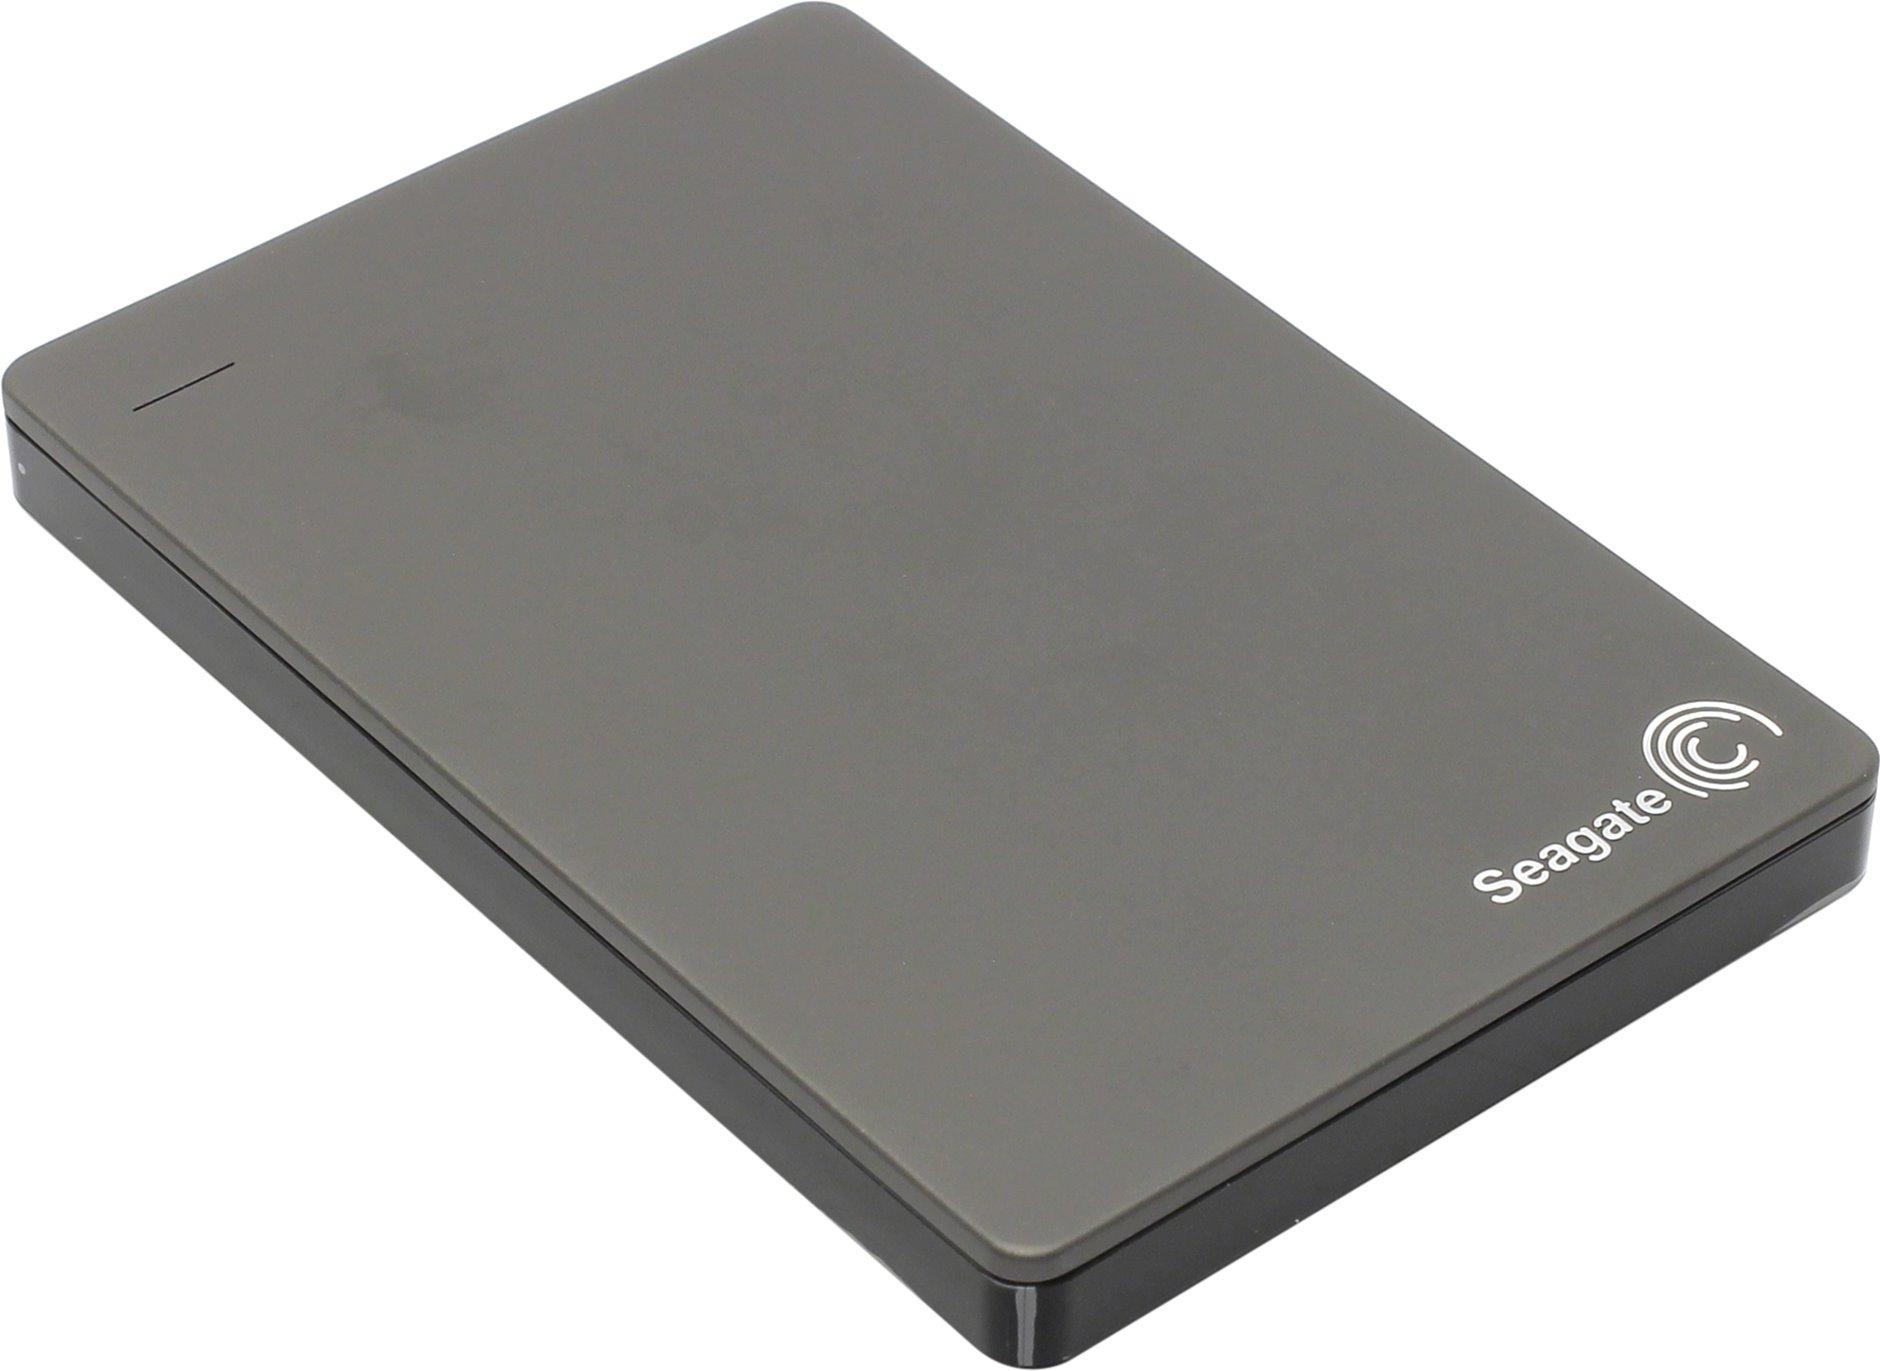 Seagate STDR1000201